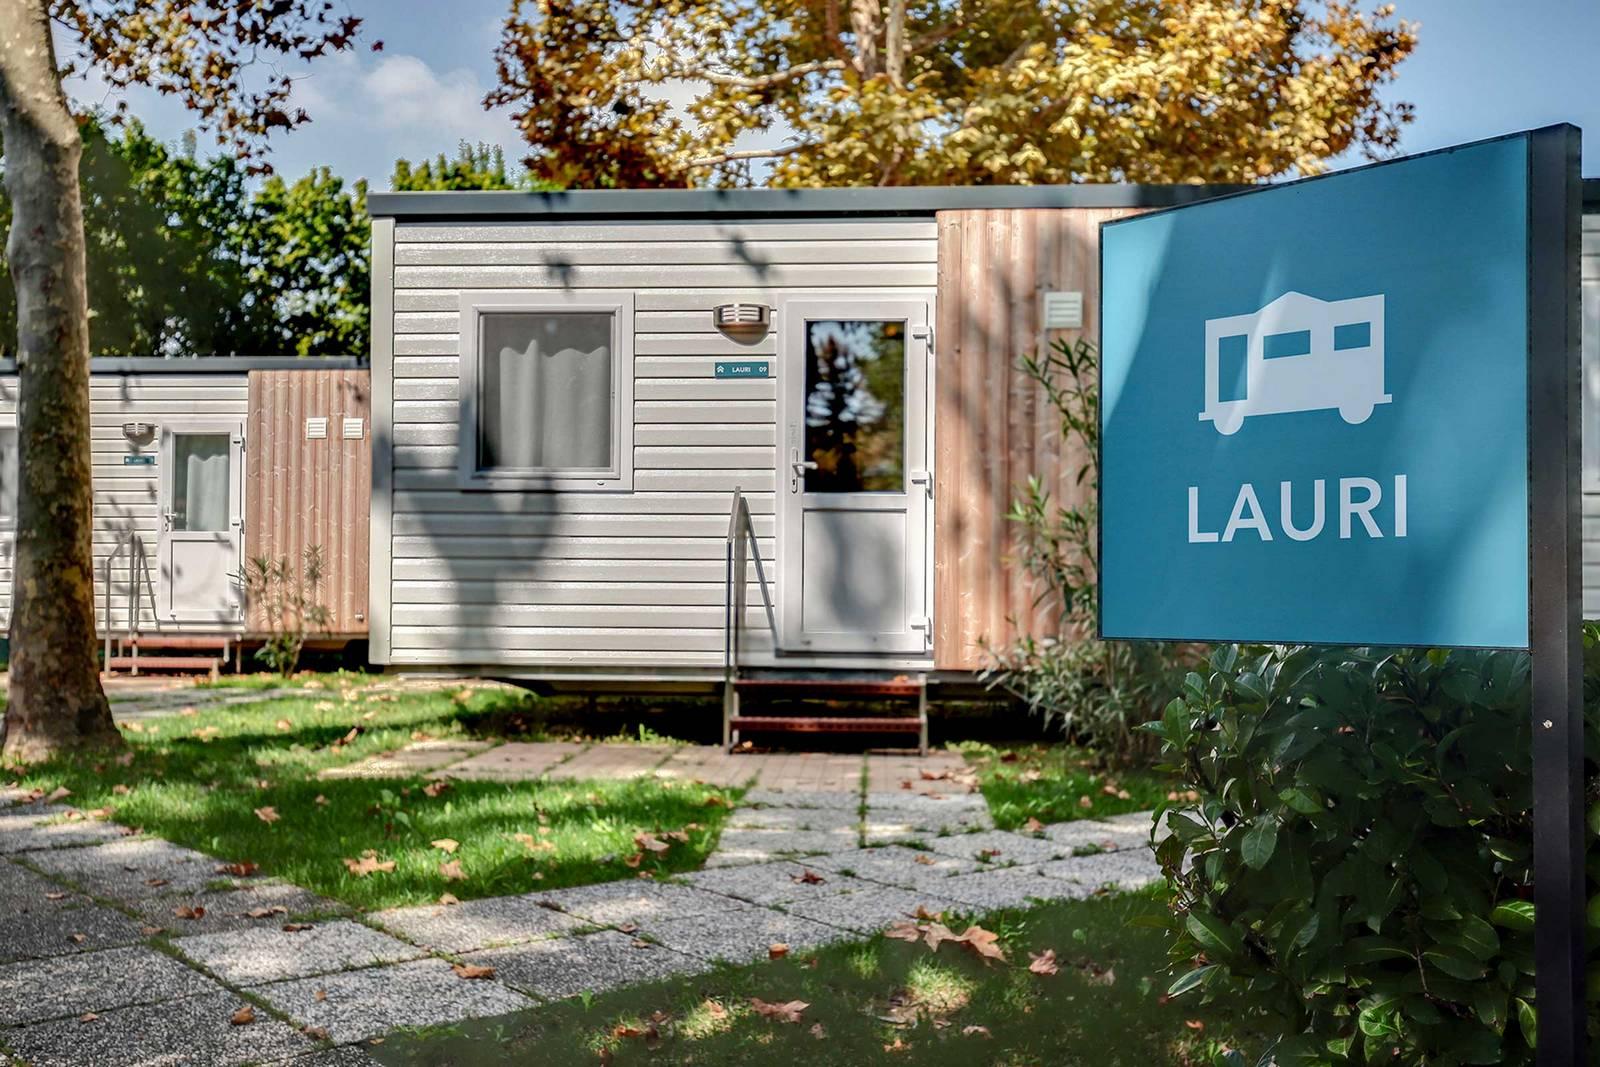 bungalow lauri camping fusina